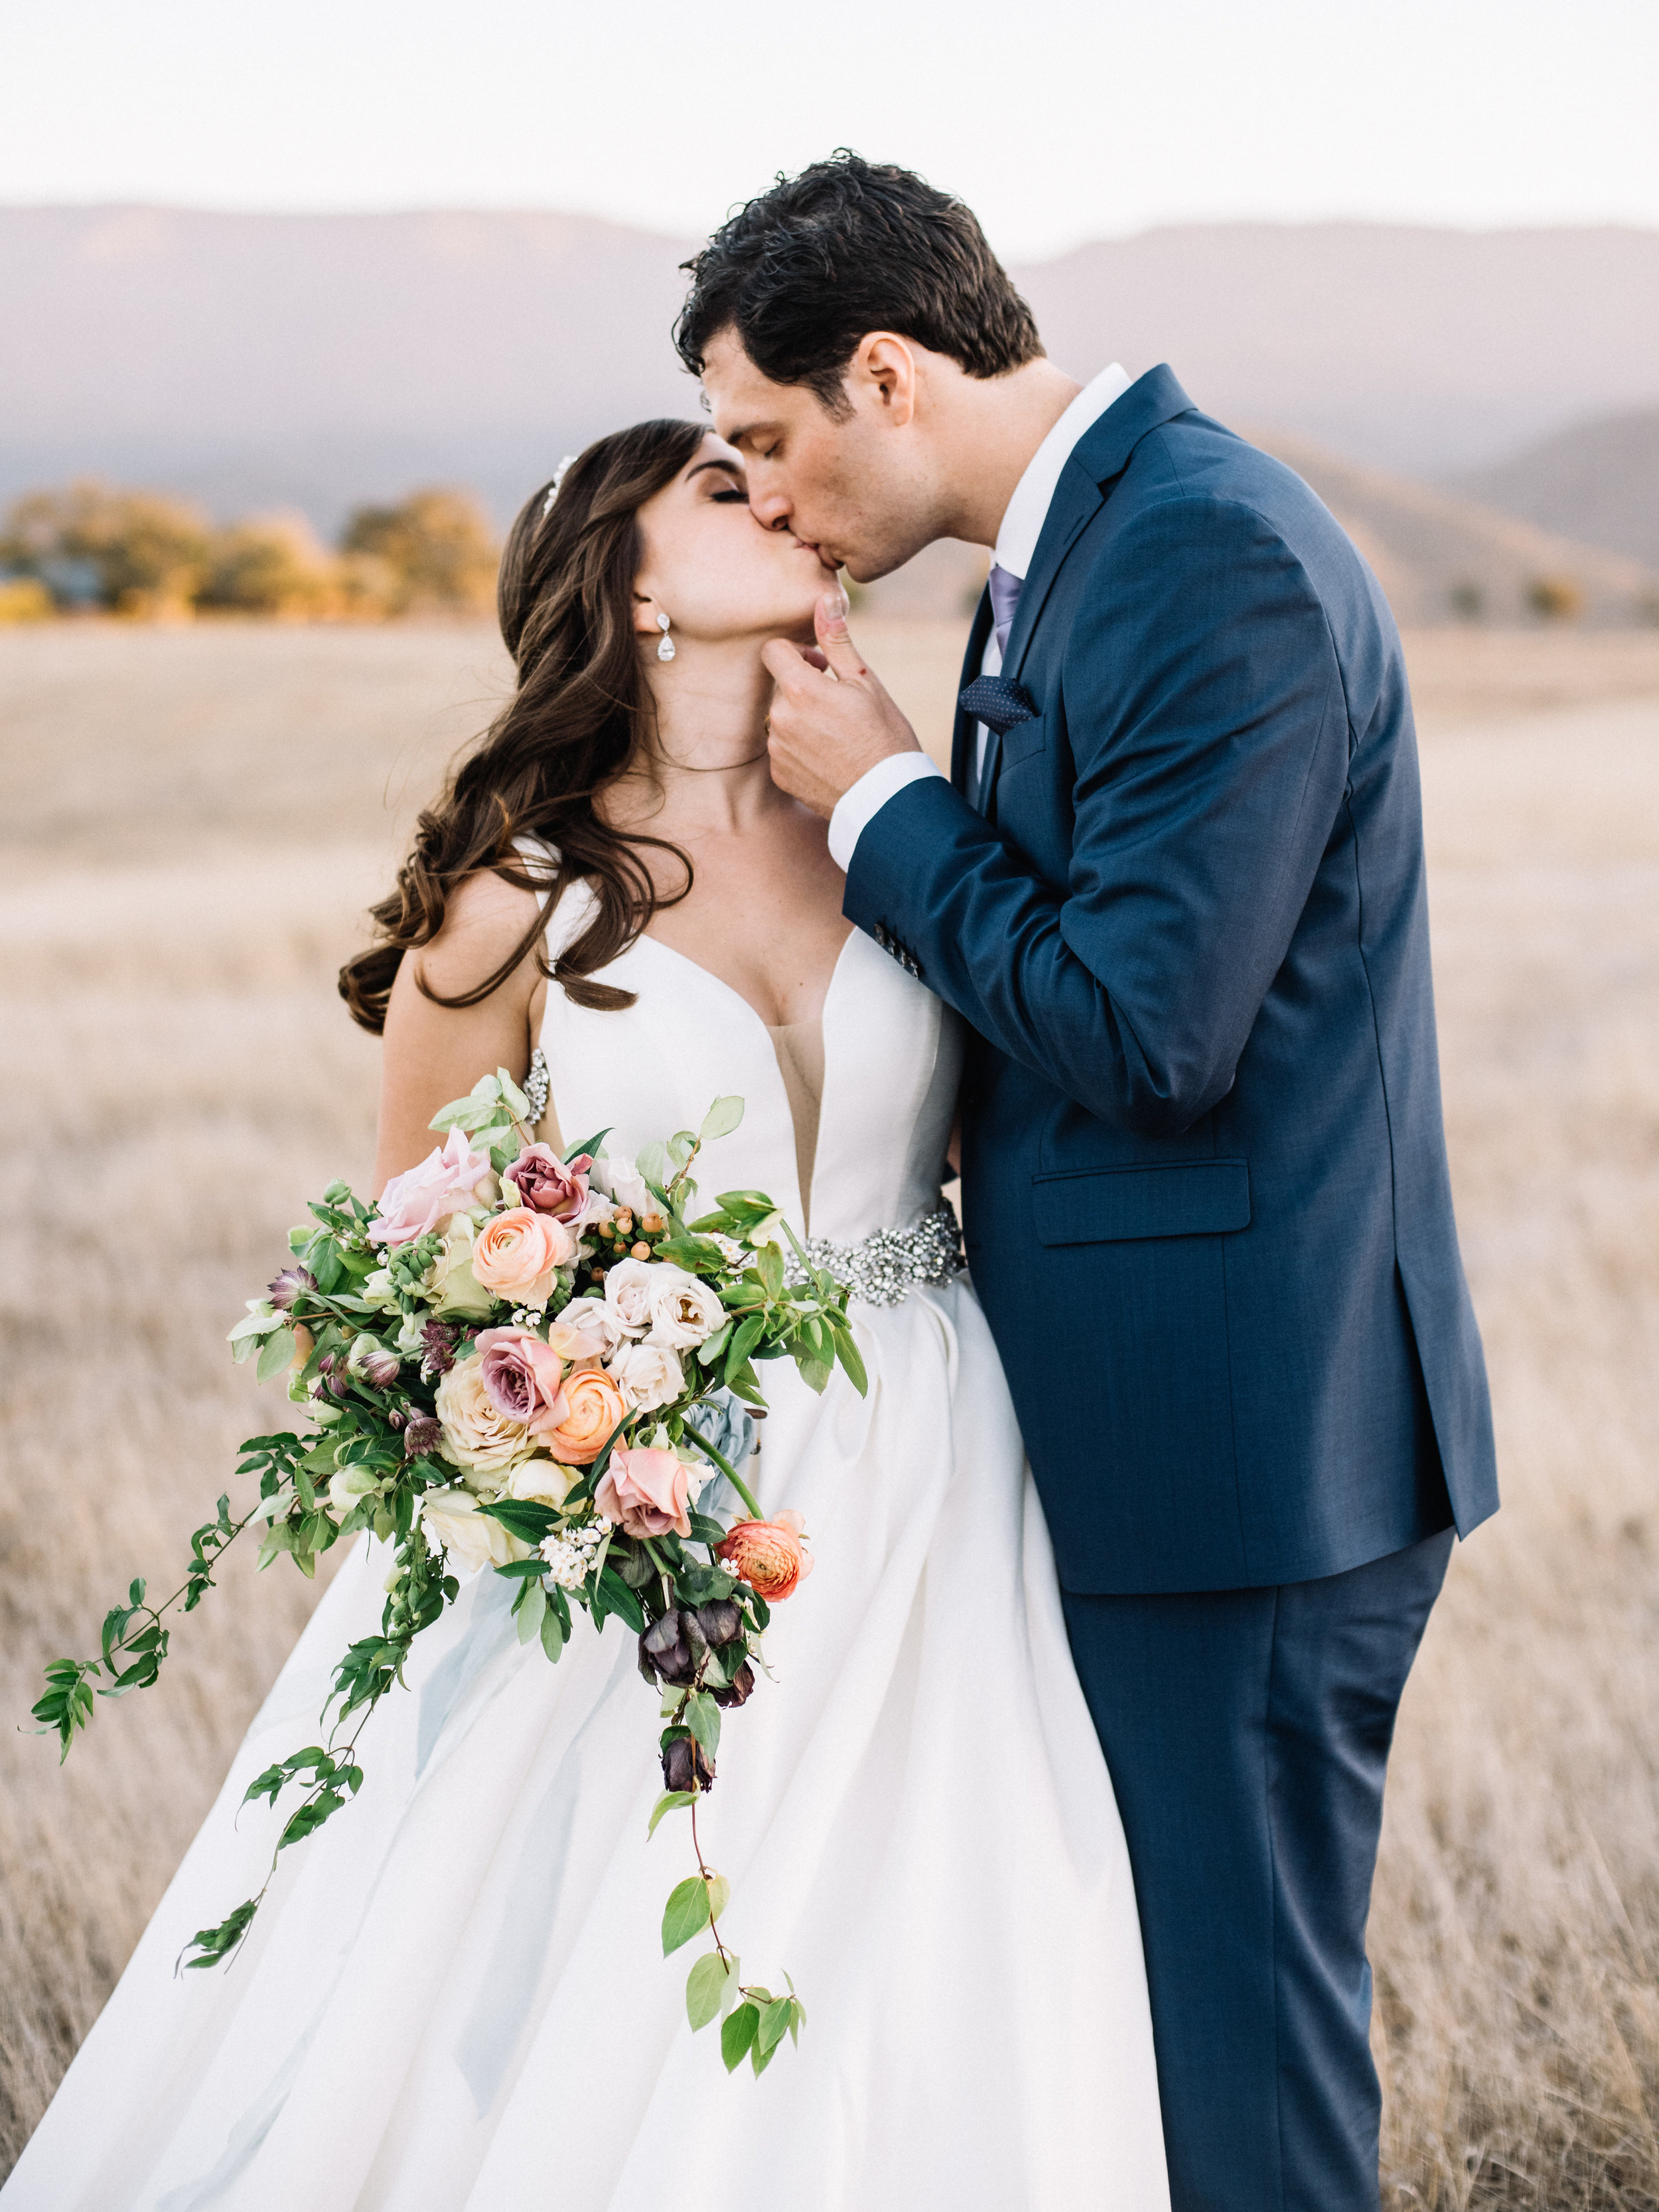 santa-barbara-elopement-elope-wedding-planner-planning-coordinator-day-of-intimate-event-design-kestrel-park-santa-ynez-english-country-estate-garden-castle (30).jpg